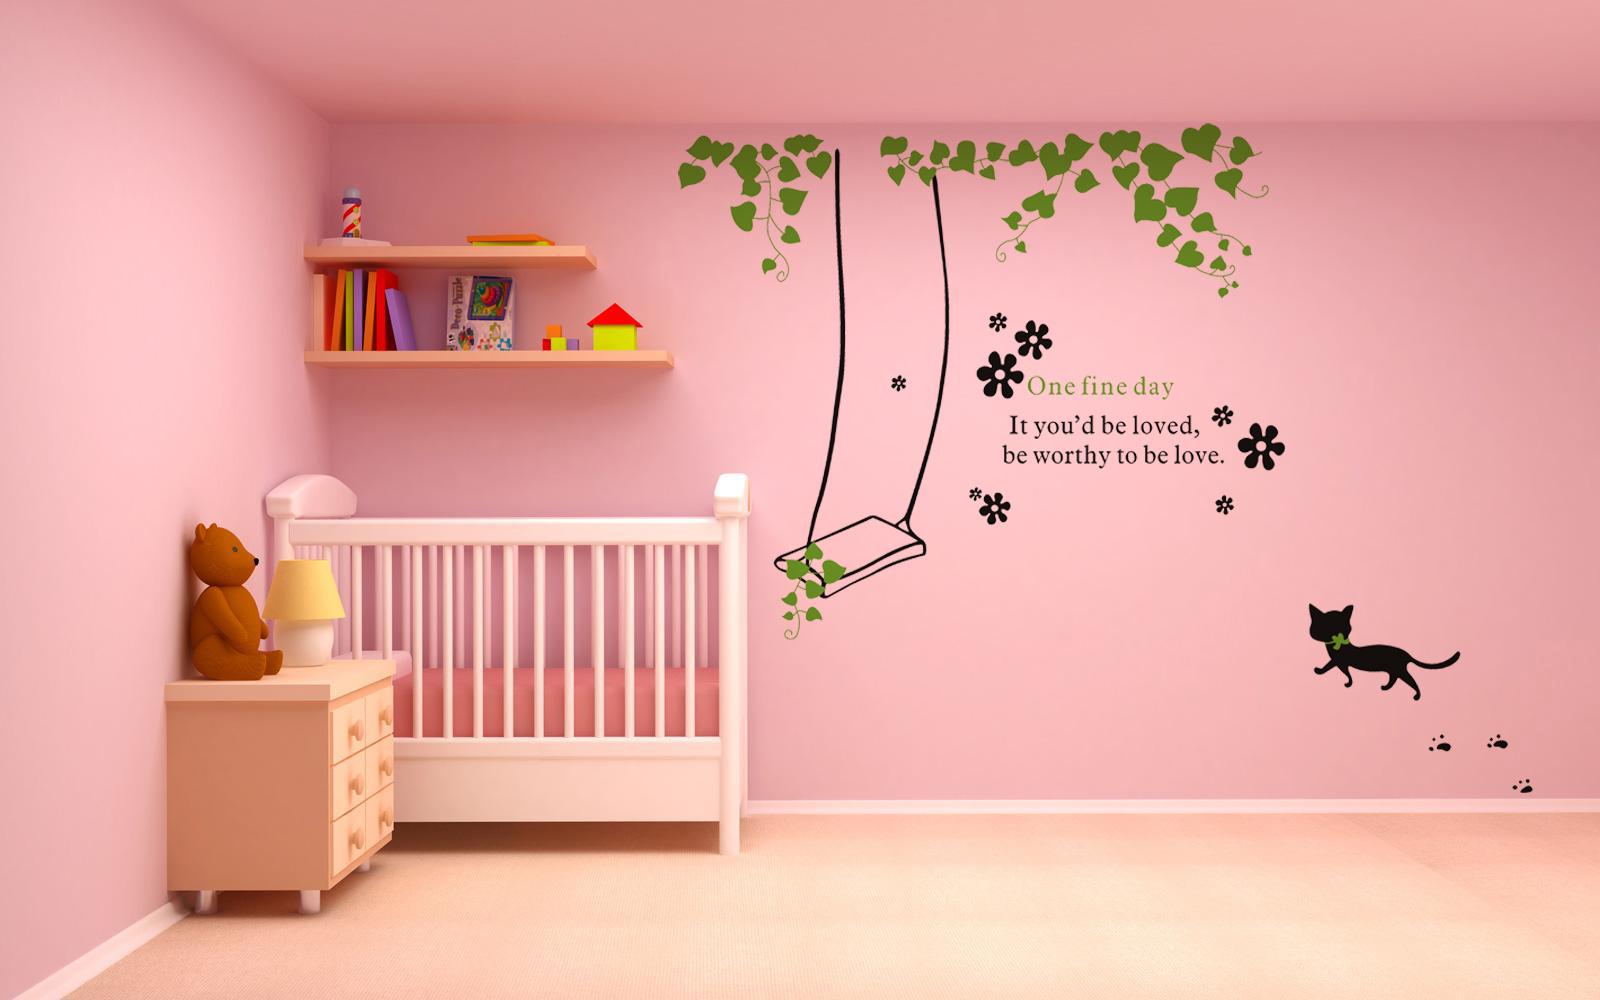 sticker balan oire dans du lierre avec chat stickers citations ambiance sticker. Black Bedroom Furniture Sets. Home Design Ideas